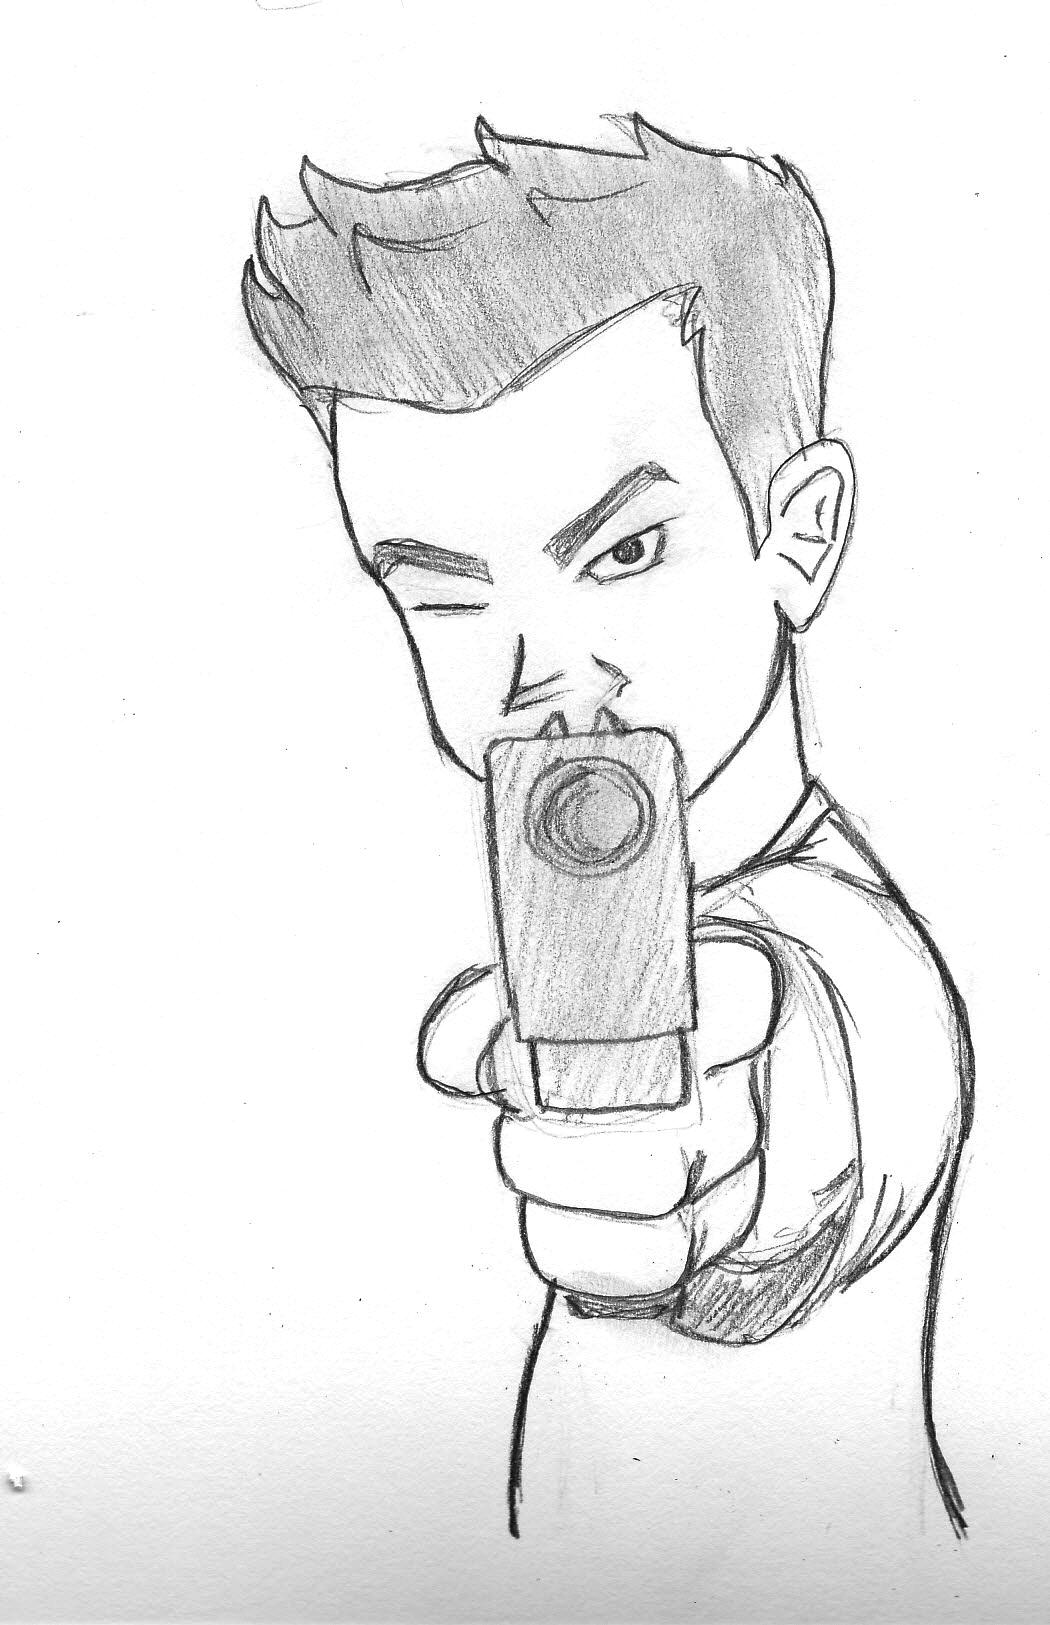 Drawn pistol sketch I find game was Kotaku